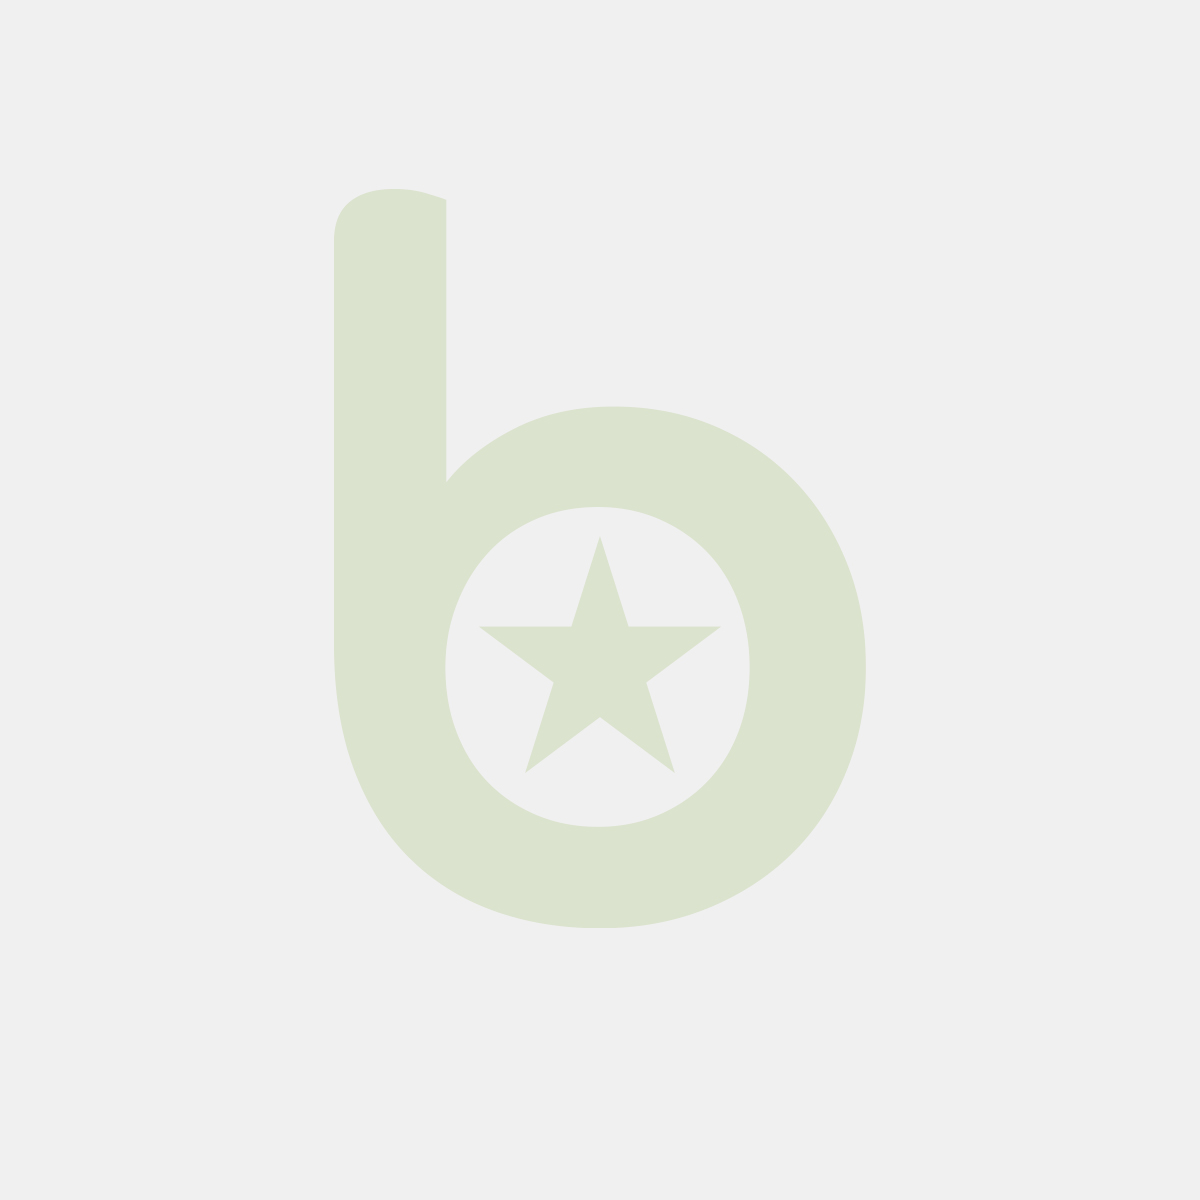 FINGERFOOD - pucharek MINI 50ml wyższy bok BUTLER 3,8x3,8x7,7cm op. 24 sztuki